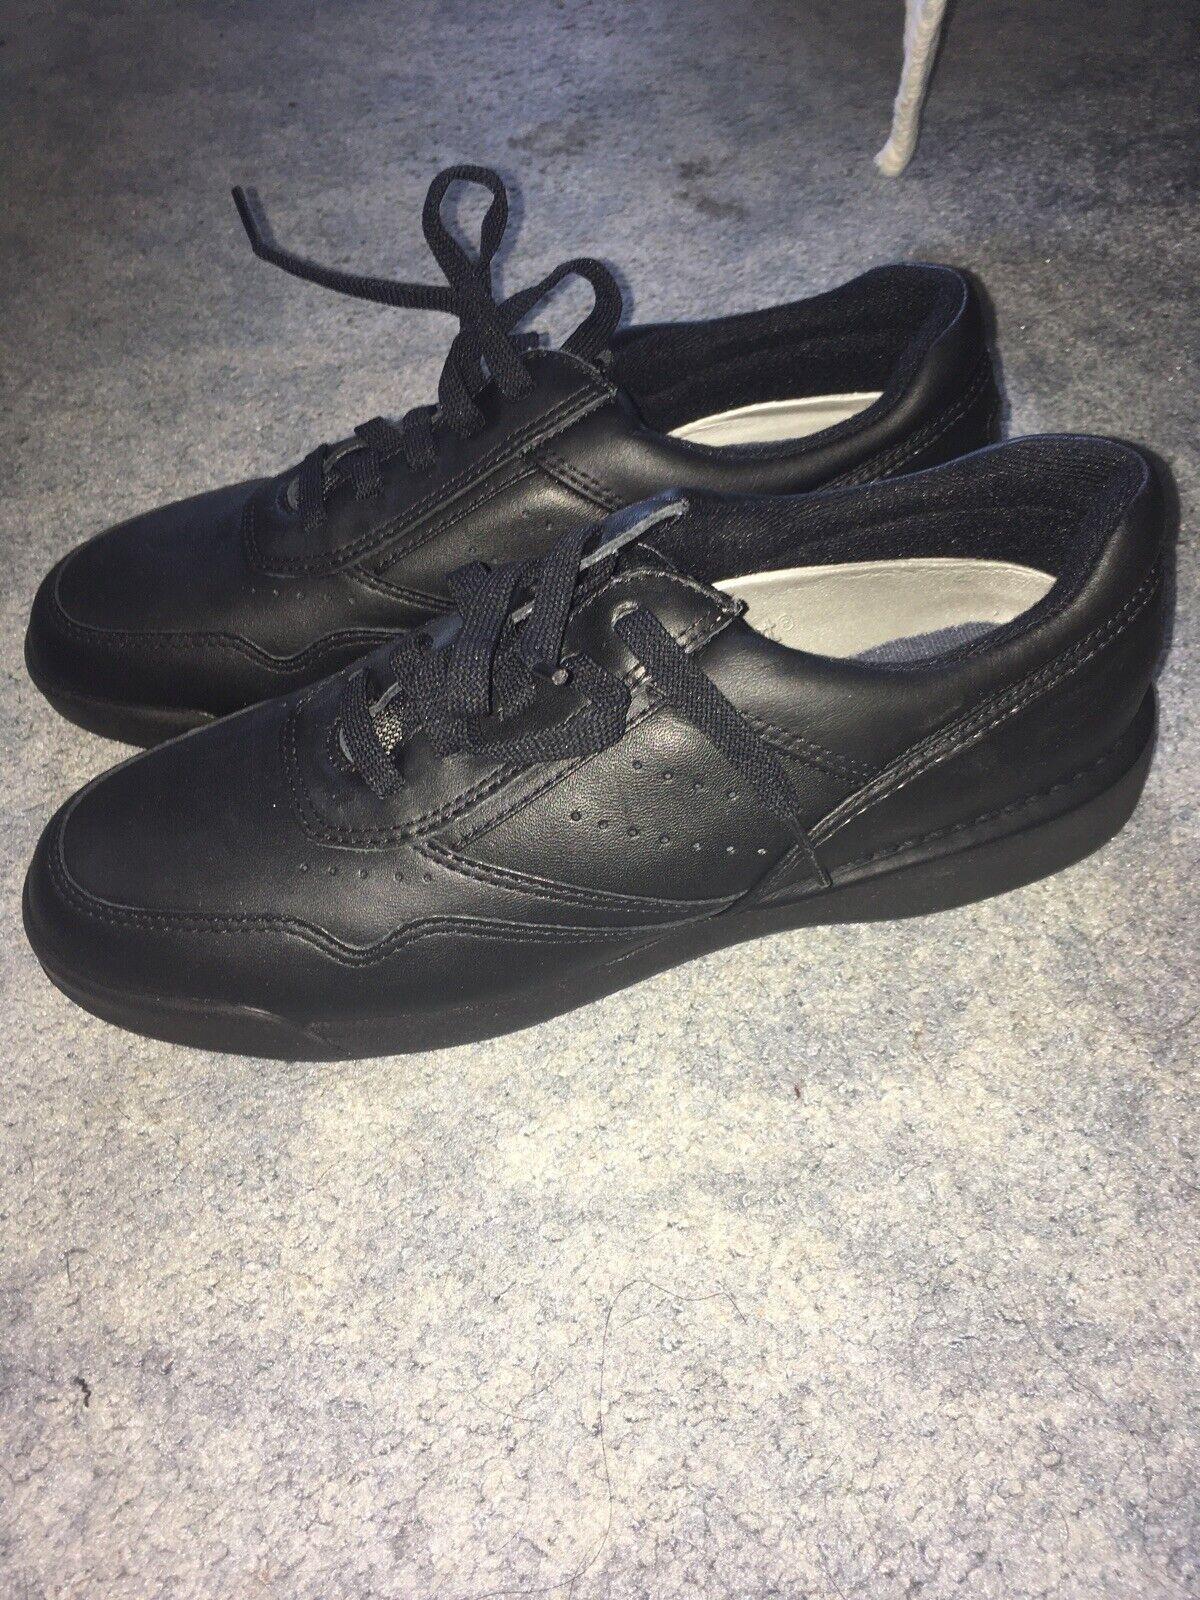 Rockport M7108 ProWalker Black Sneakers